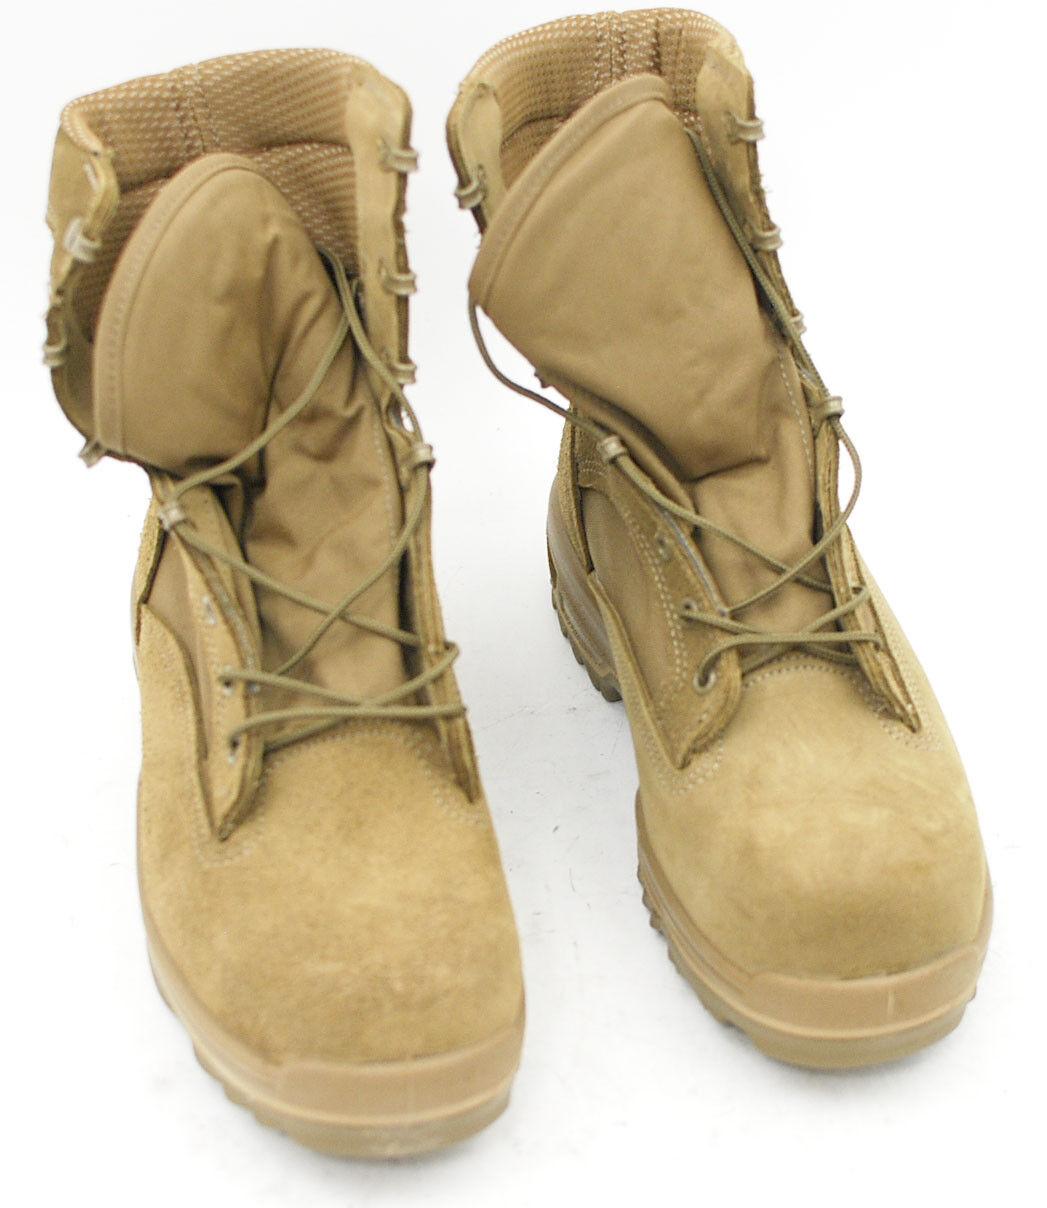 Bates Men's Terrax3 Hot Weather Comp Toe Coyote Military & Tactical Boots 9.5